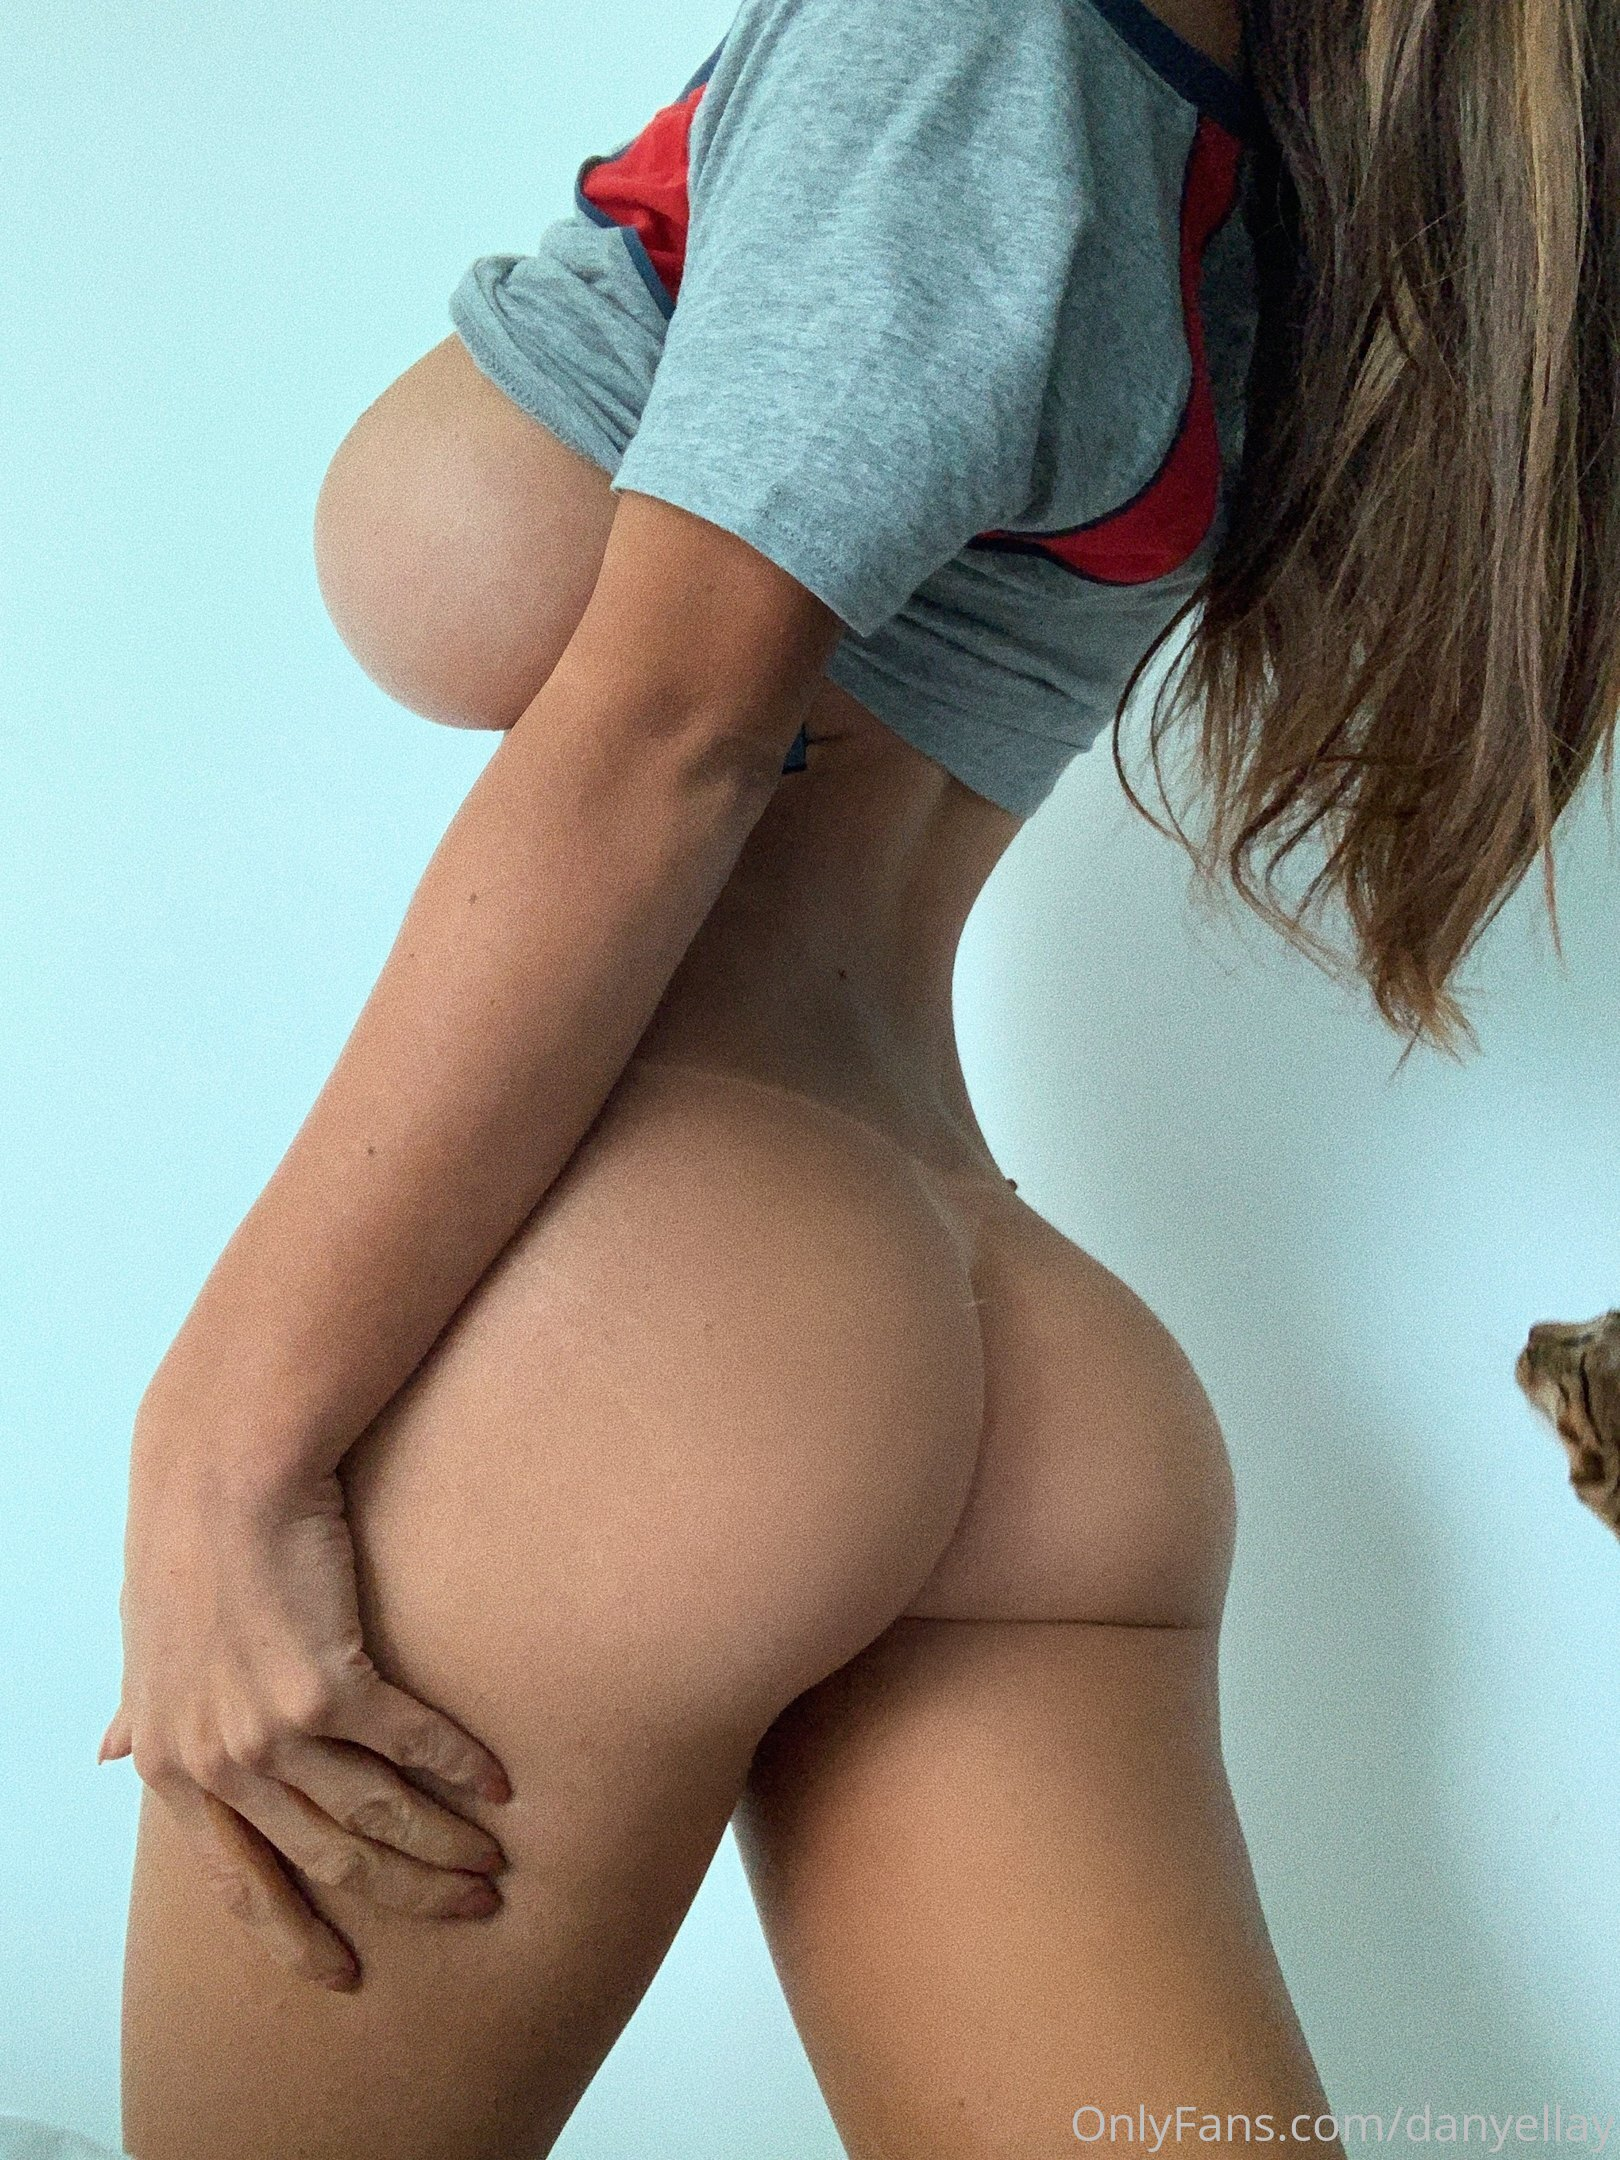 Danielley Ayala 0272